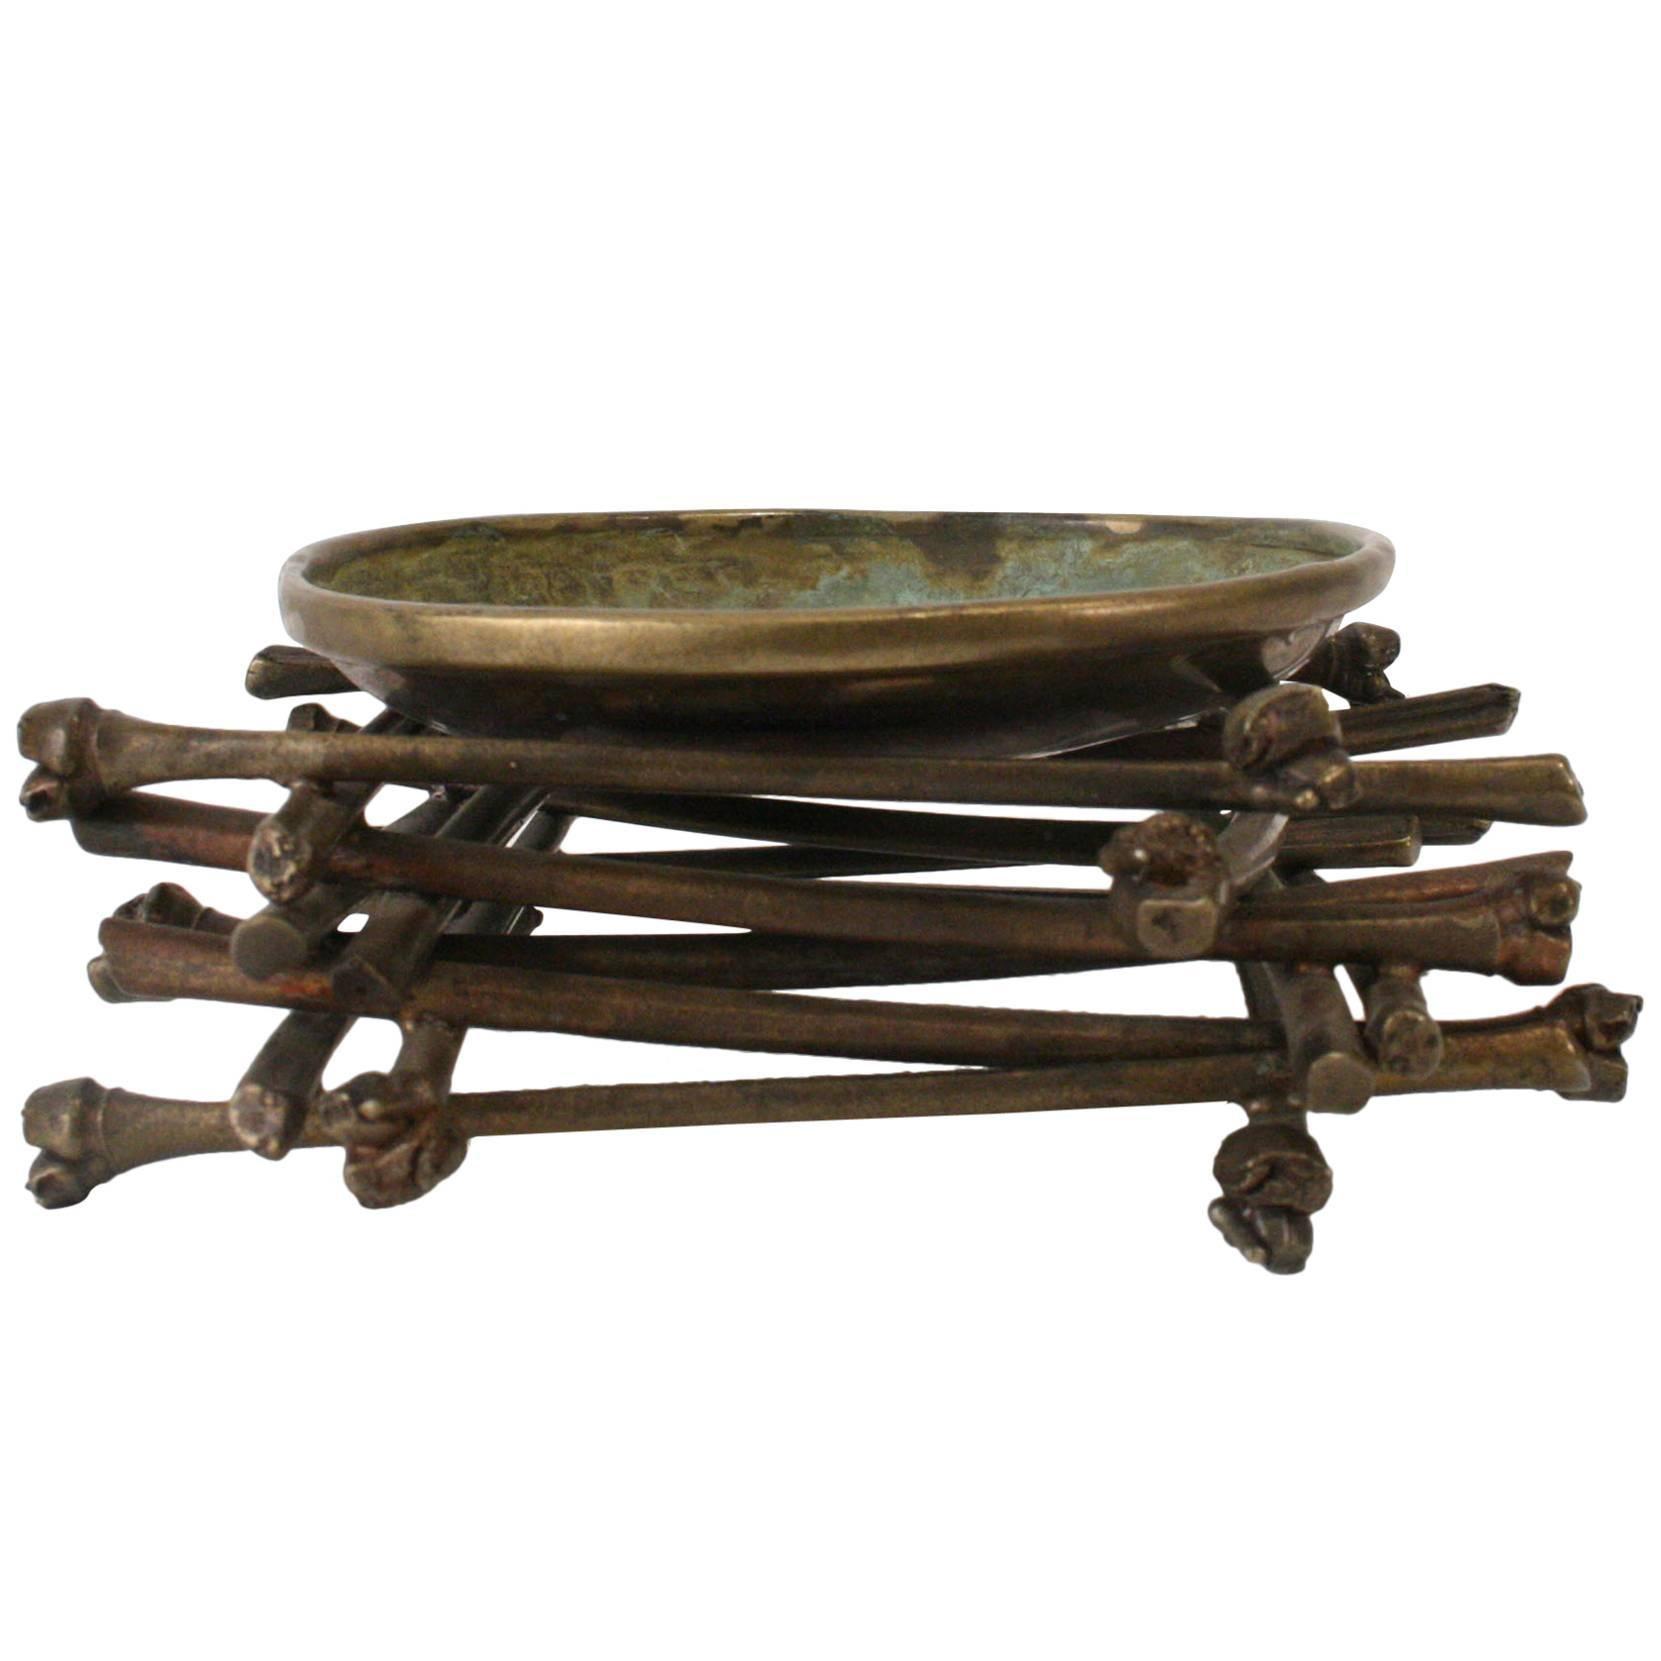 "Robert Lee Morris ""Ritual Bowl on a Bamboo Pyre"" Sculpture"